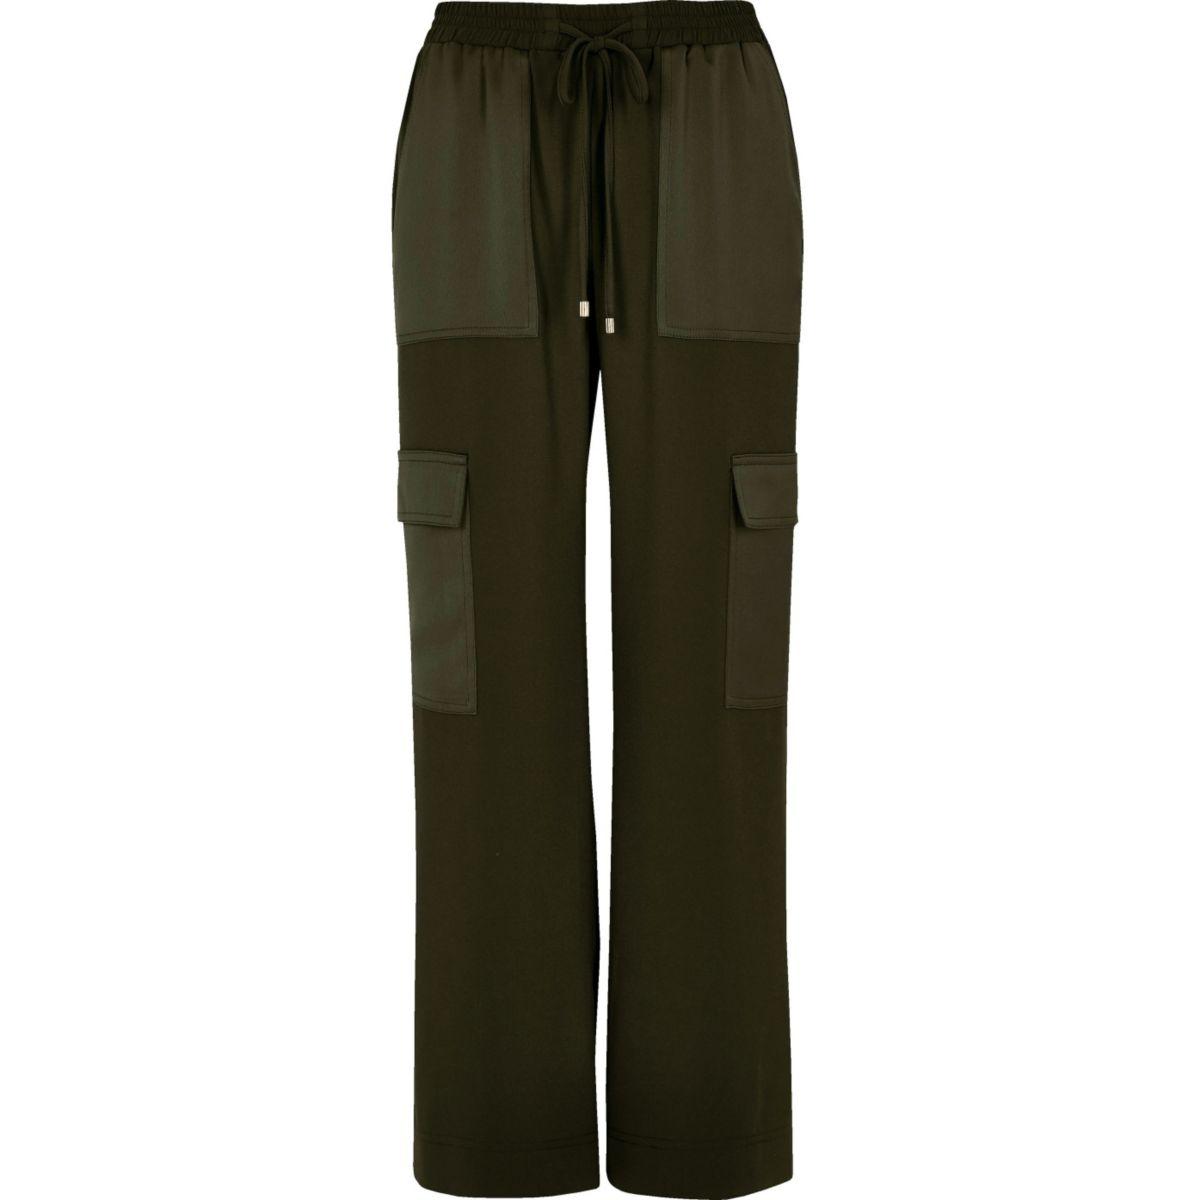 Khaki soft woven combat trousers